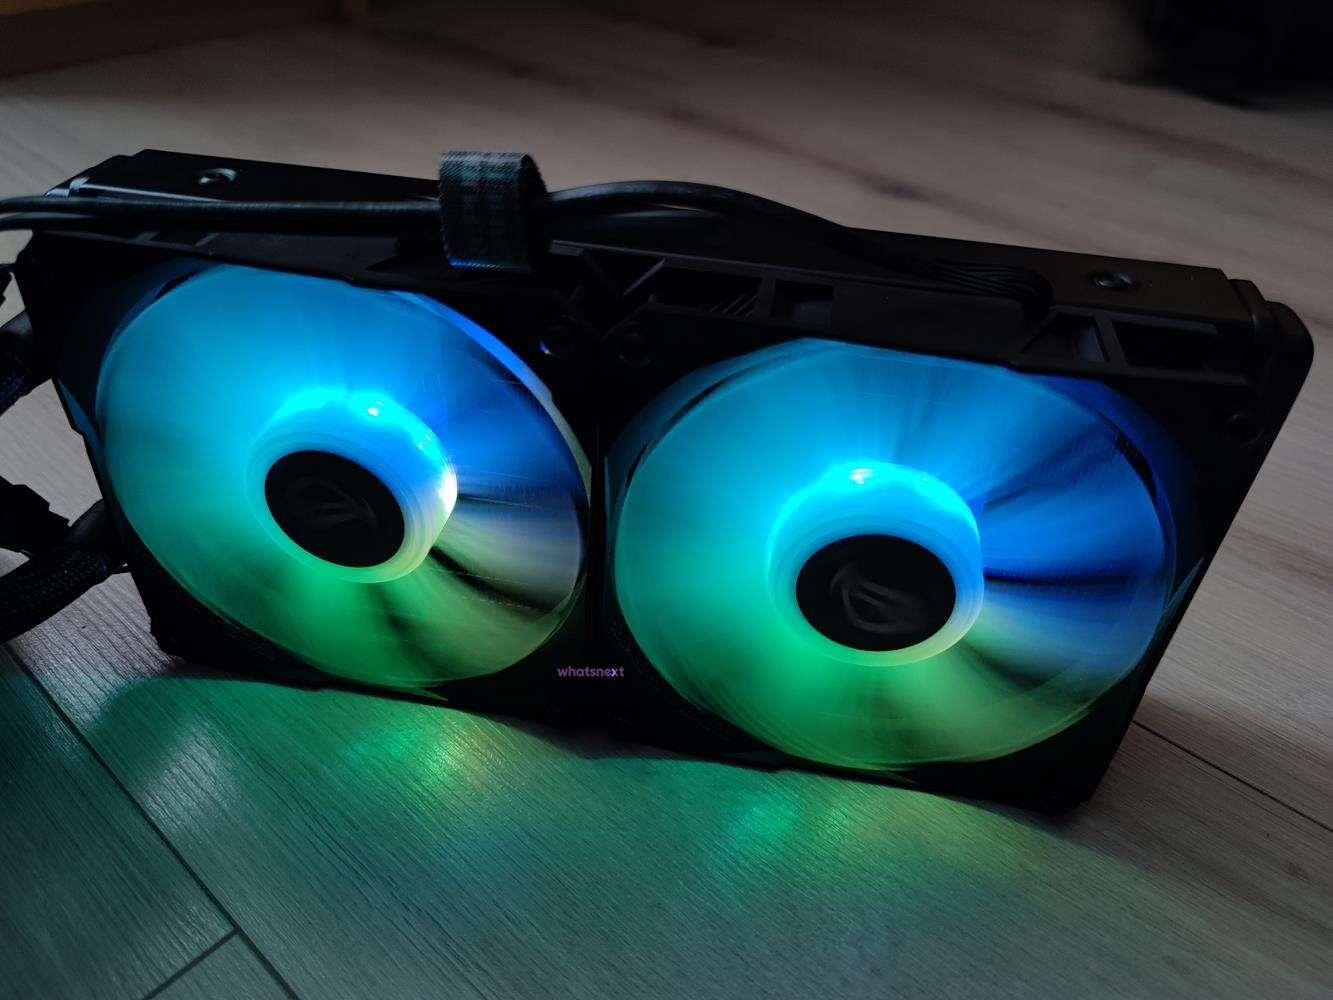 test Asus GeForce RTX 3080 Ti ROG Strix LC OC, opinia Asus GeForce RTX 3080 Ti ROG Strix LC OC, recenzja Asus GeForce RTX 3080 Ti ROG Strix LC OC